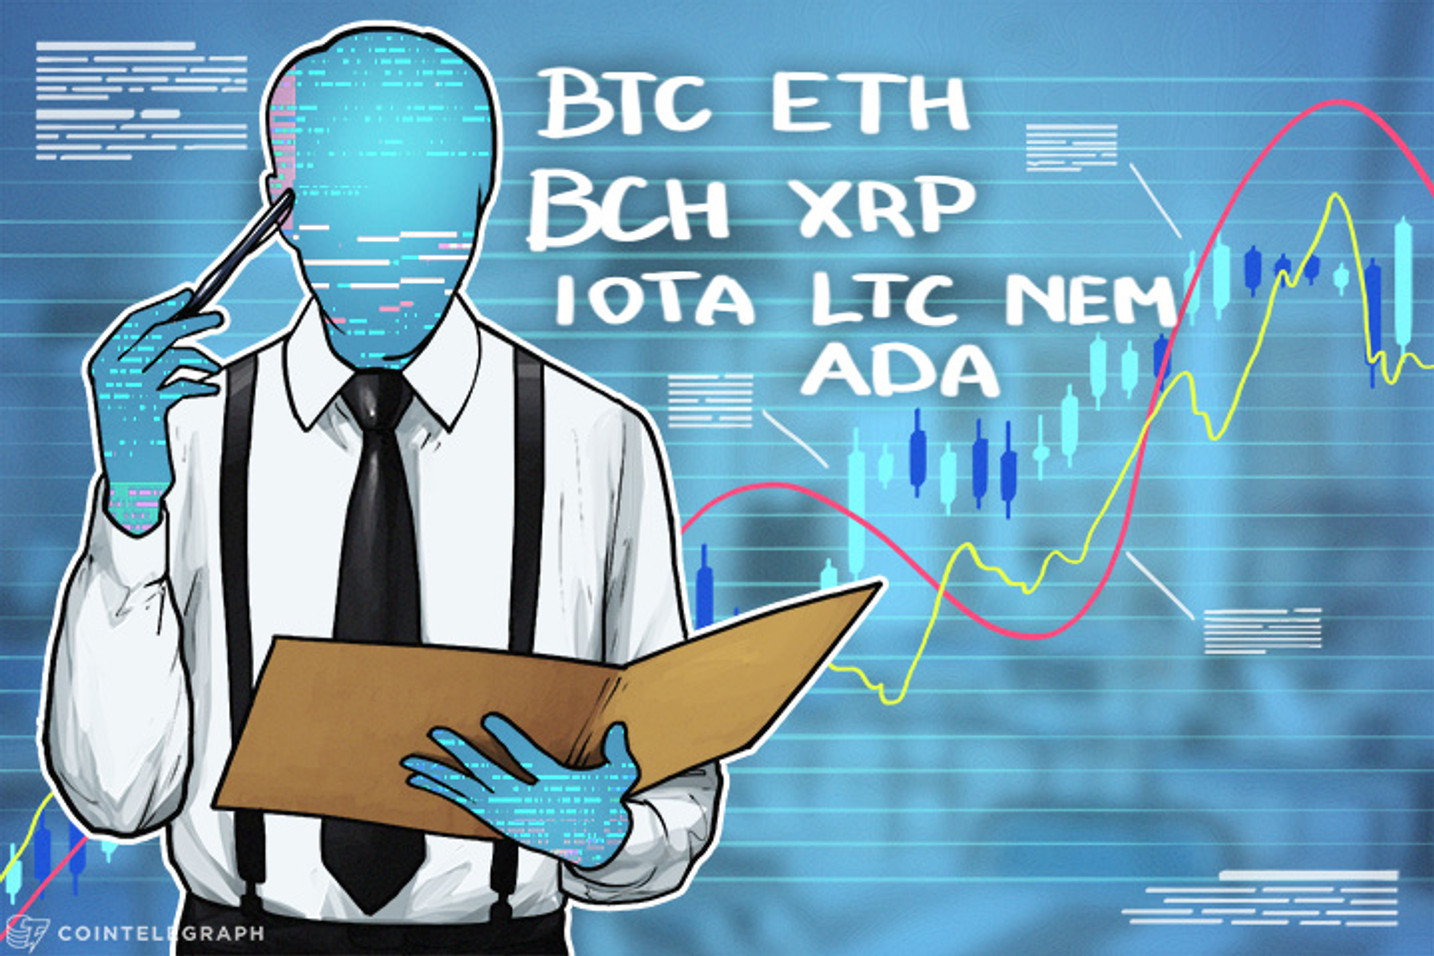 Price Analysis, Jan 16: Bitcoin, Ethereum, Bitcoin Cash, Ripple, IOTA, Litecoin, NEM, and Cardano